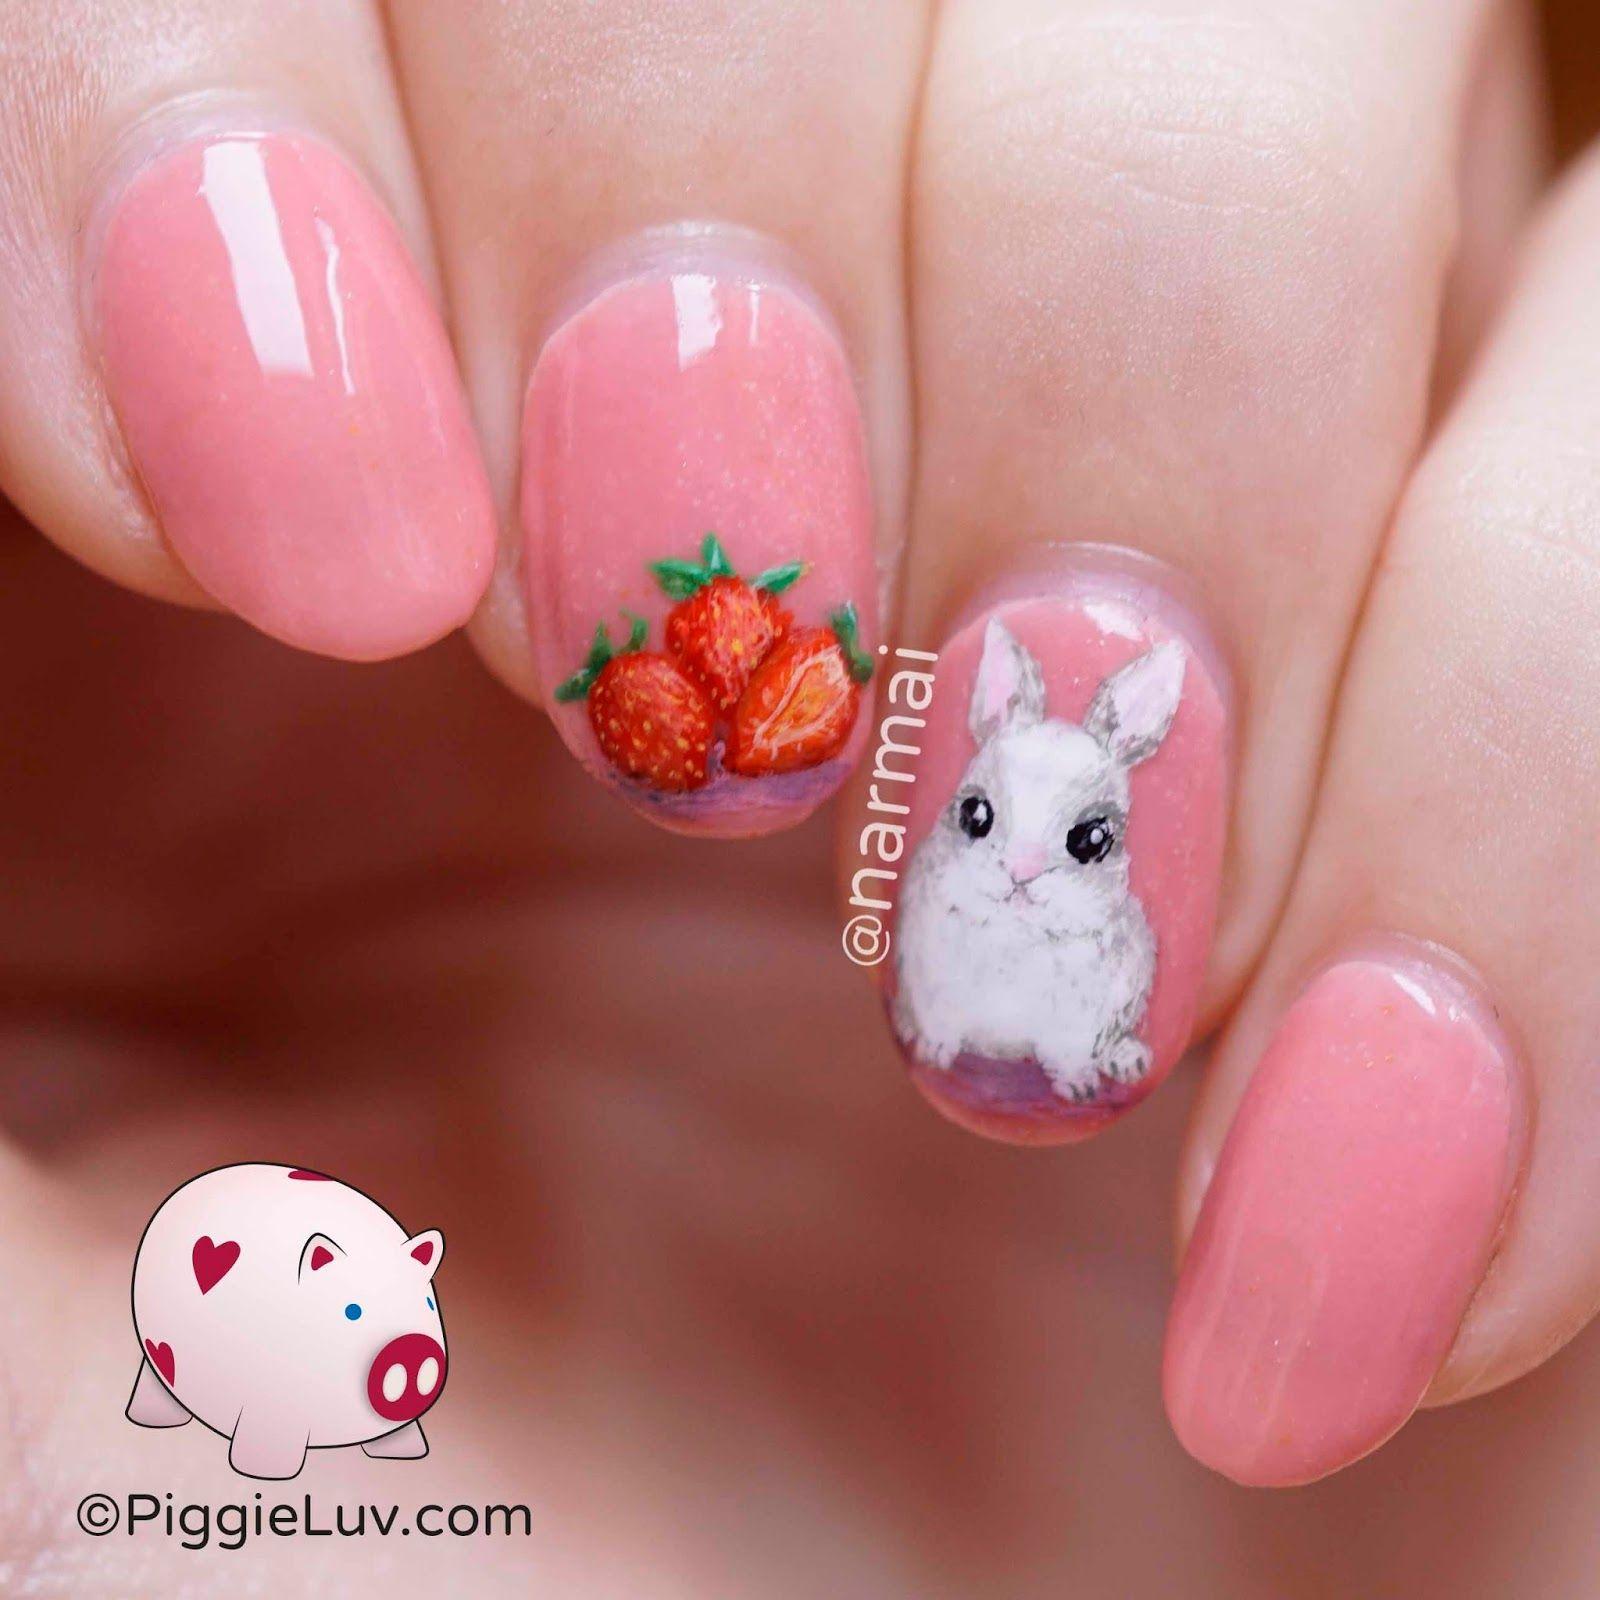 Freehand strawberry bunny nail art | Pinterest | Bunny nails, Girls ...